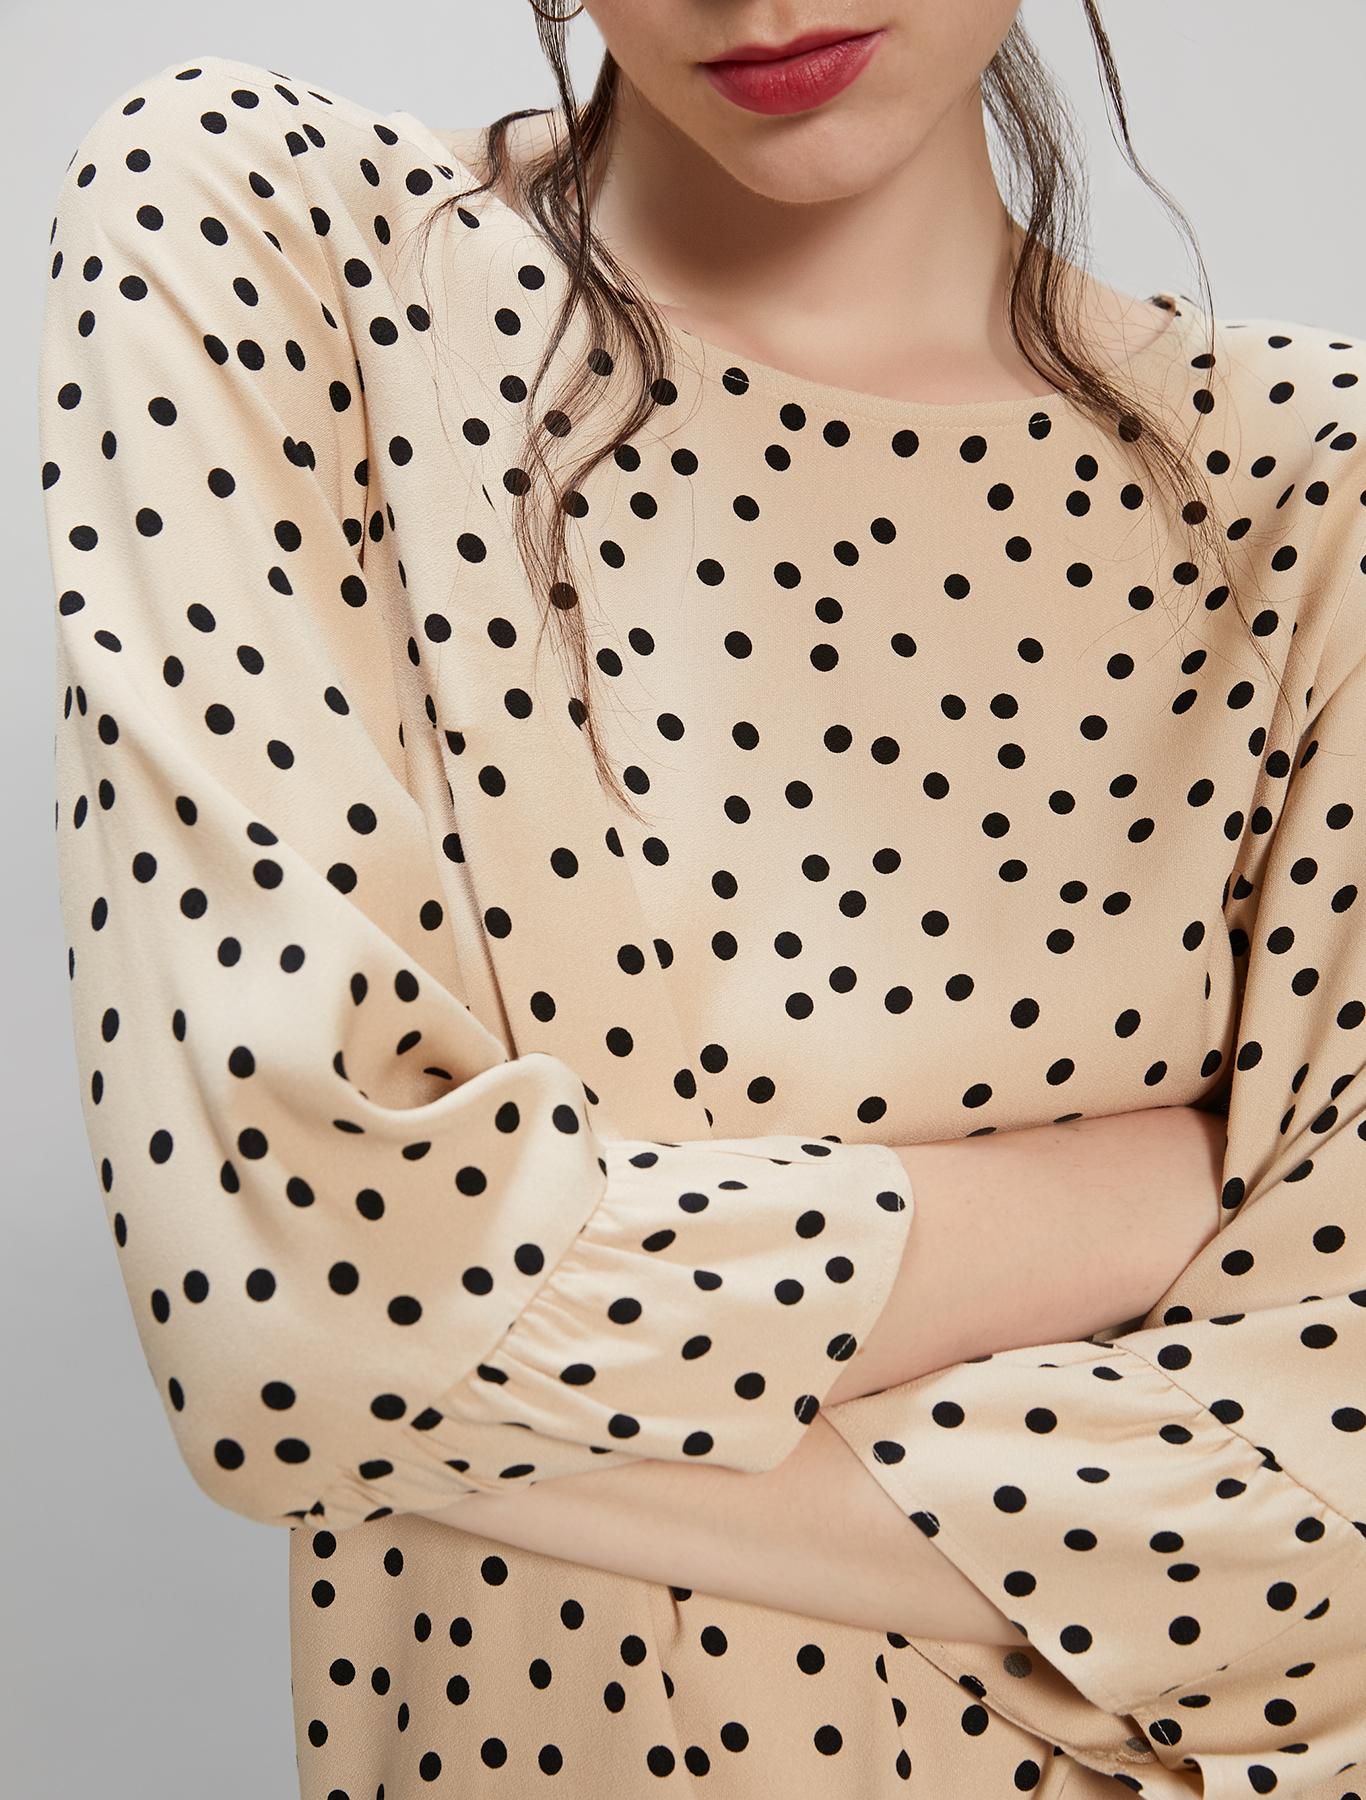 Polka dot sablé blouse - beige pattern - pennyblack